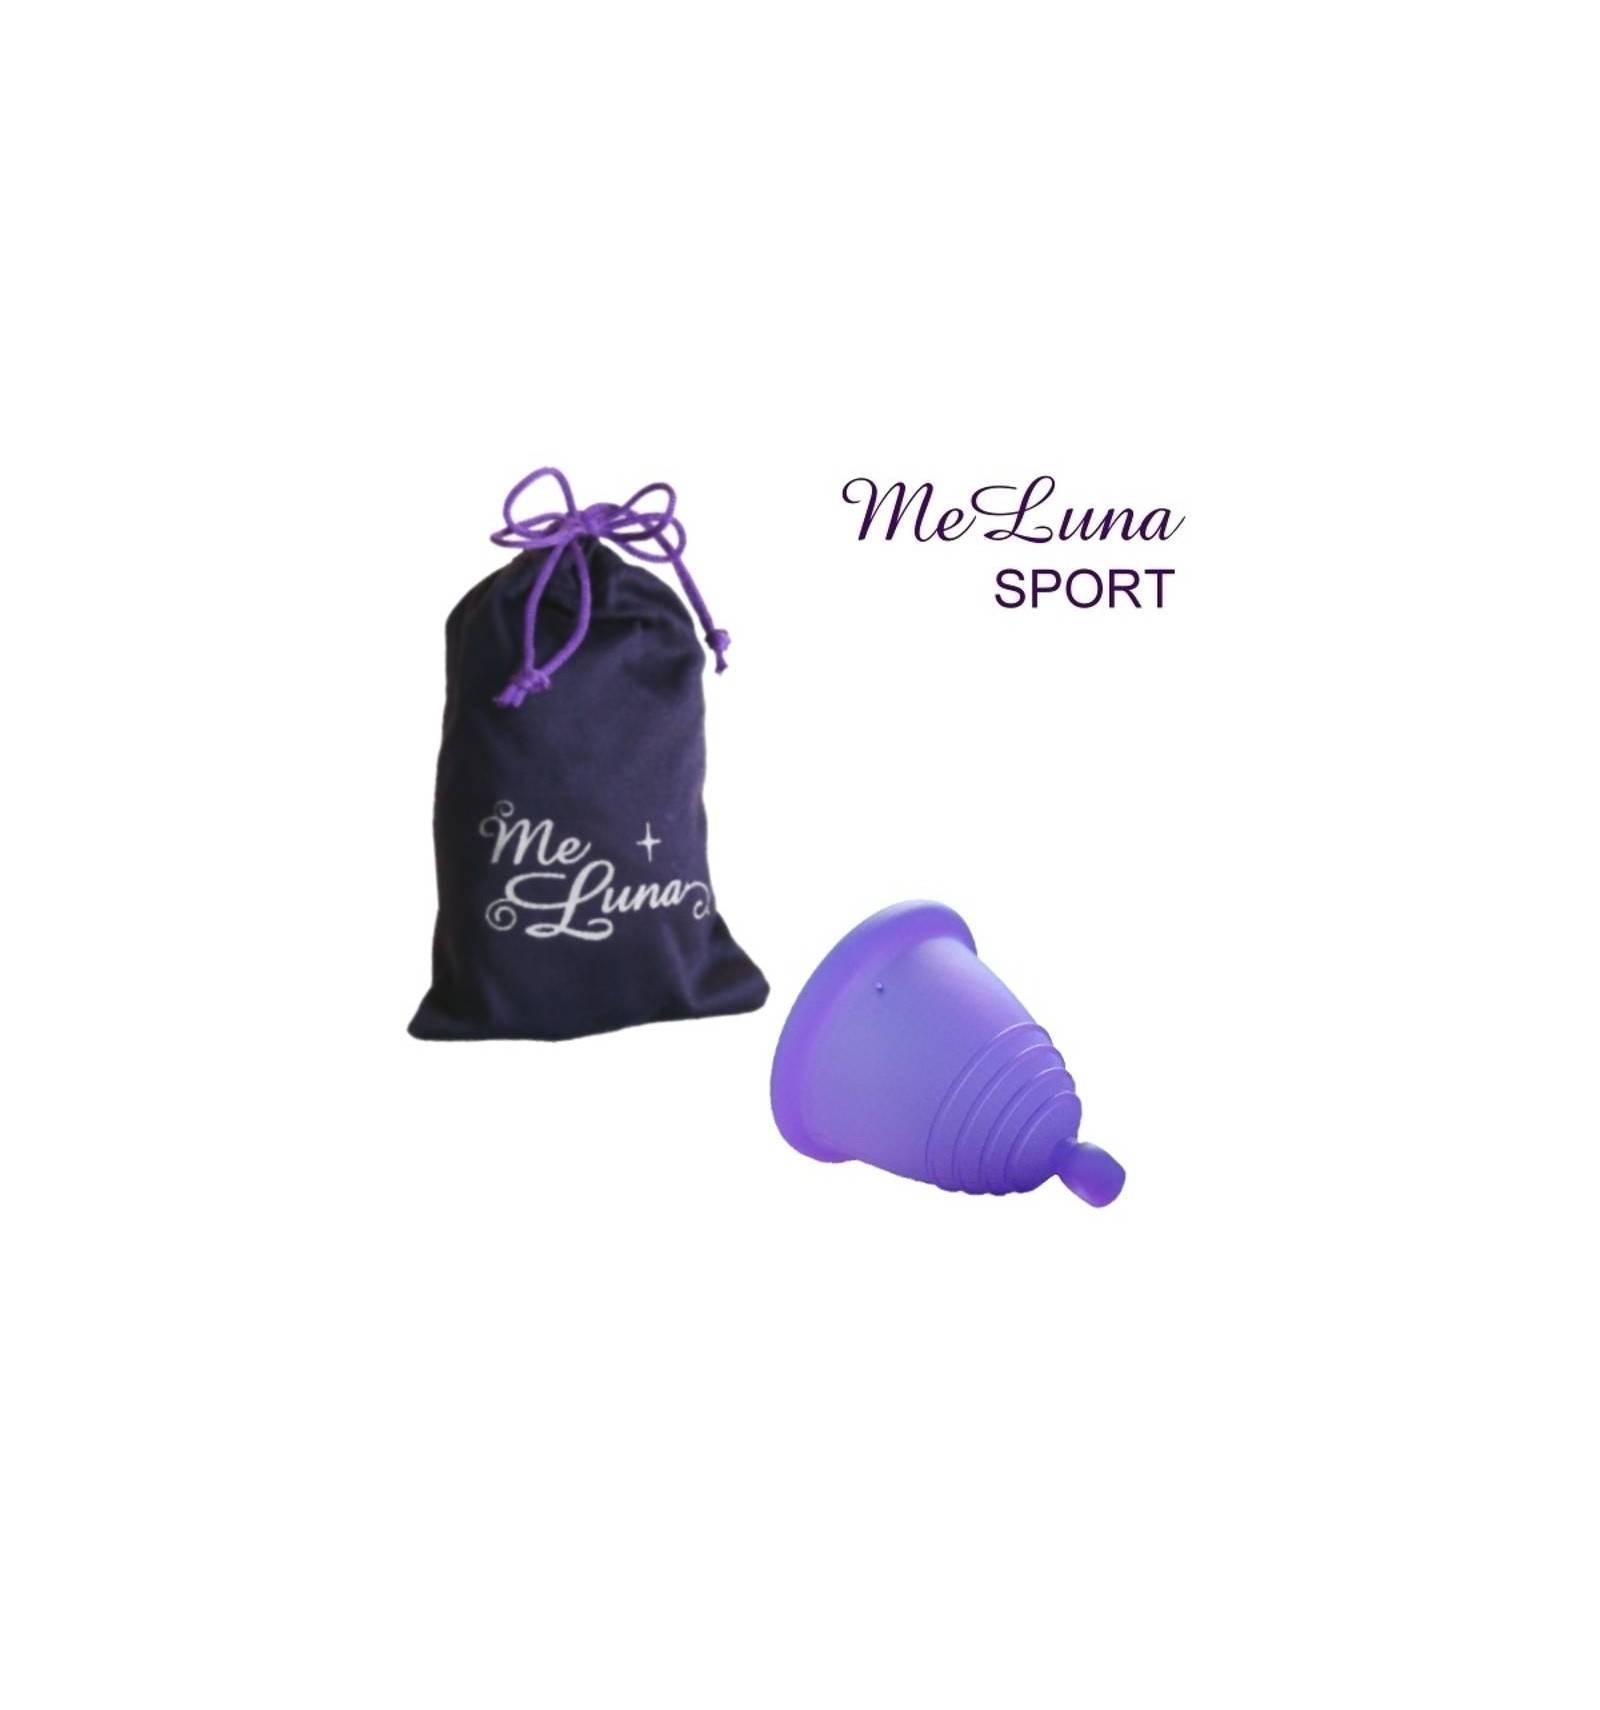 Copa menstrual MeLuna Shorty, Violeta, Sport, Bola